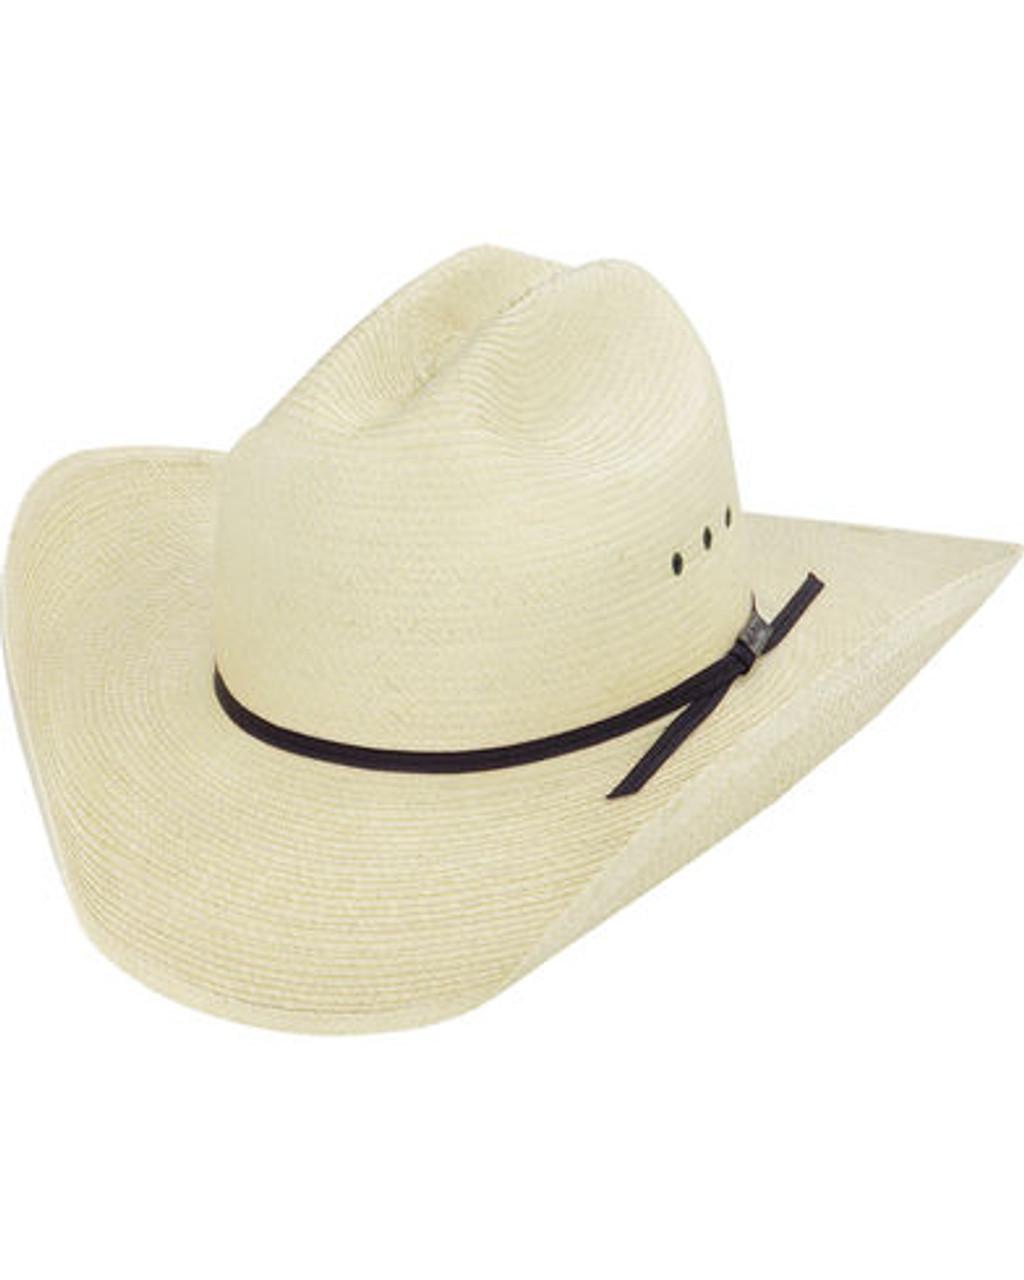 Larry Mahan Straw Hats - Cowboy Palm - Billy s Western Wear 897669be368d